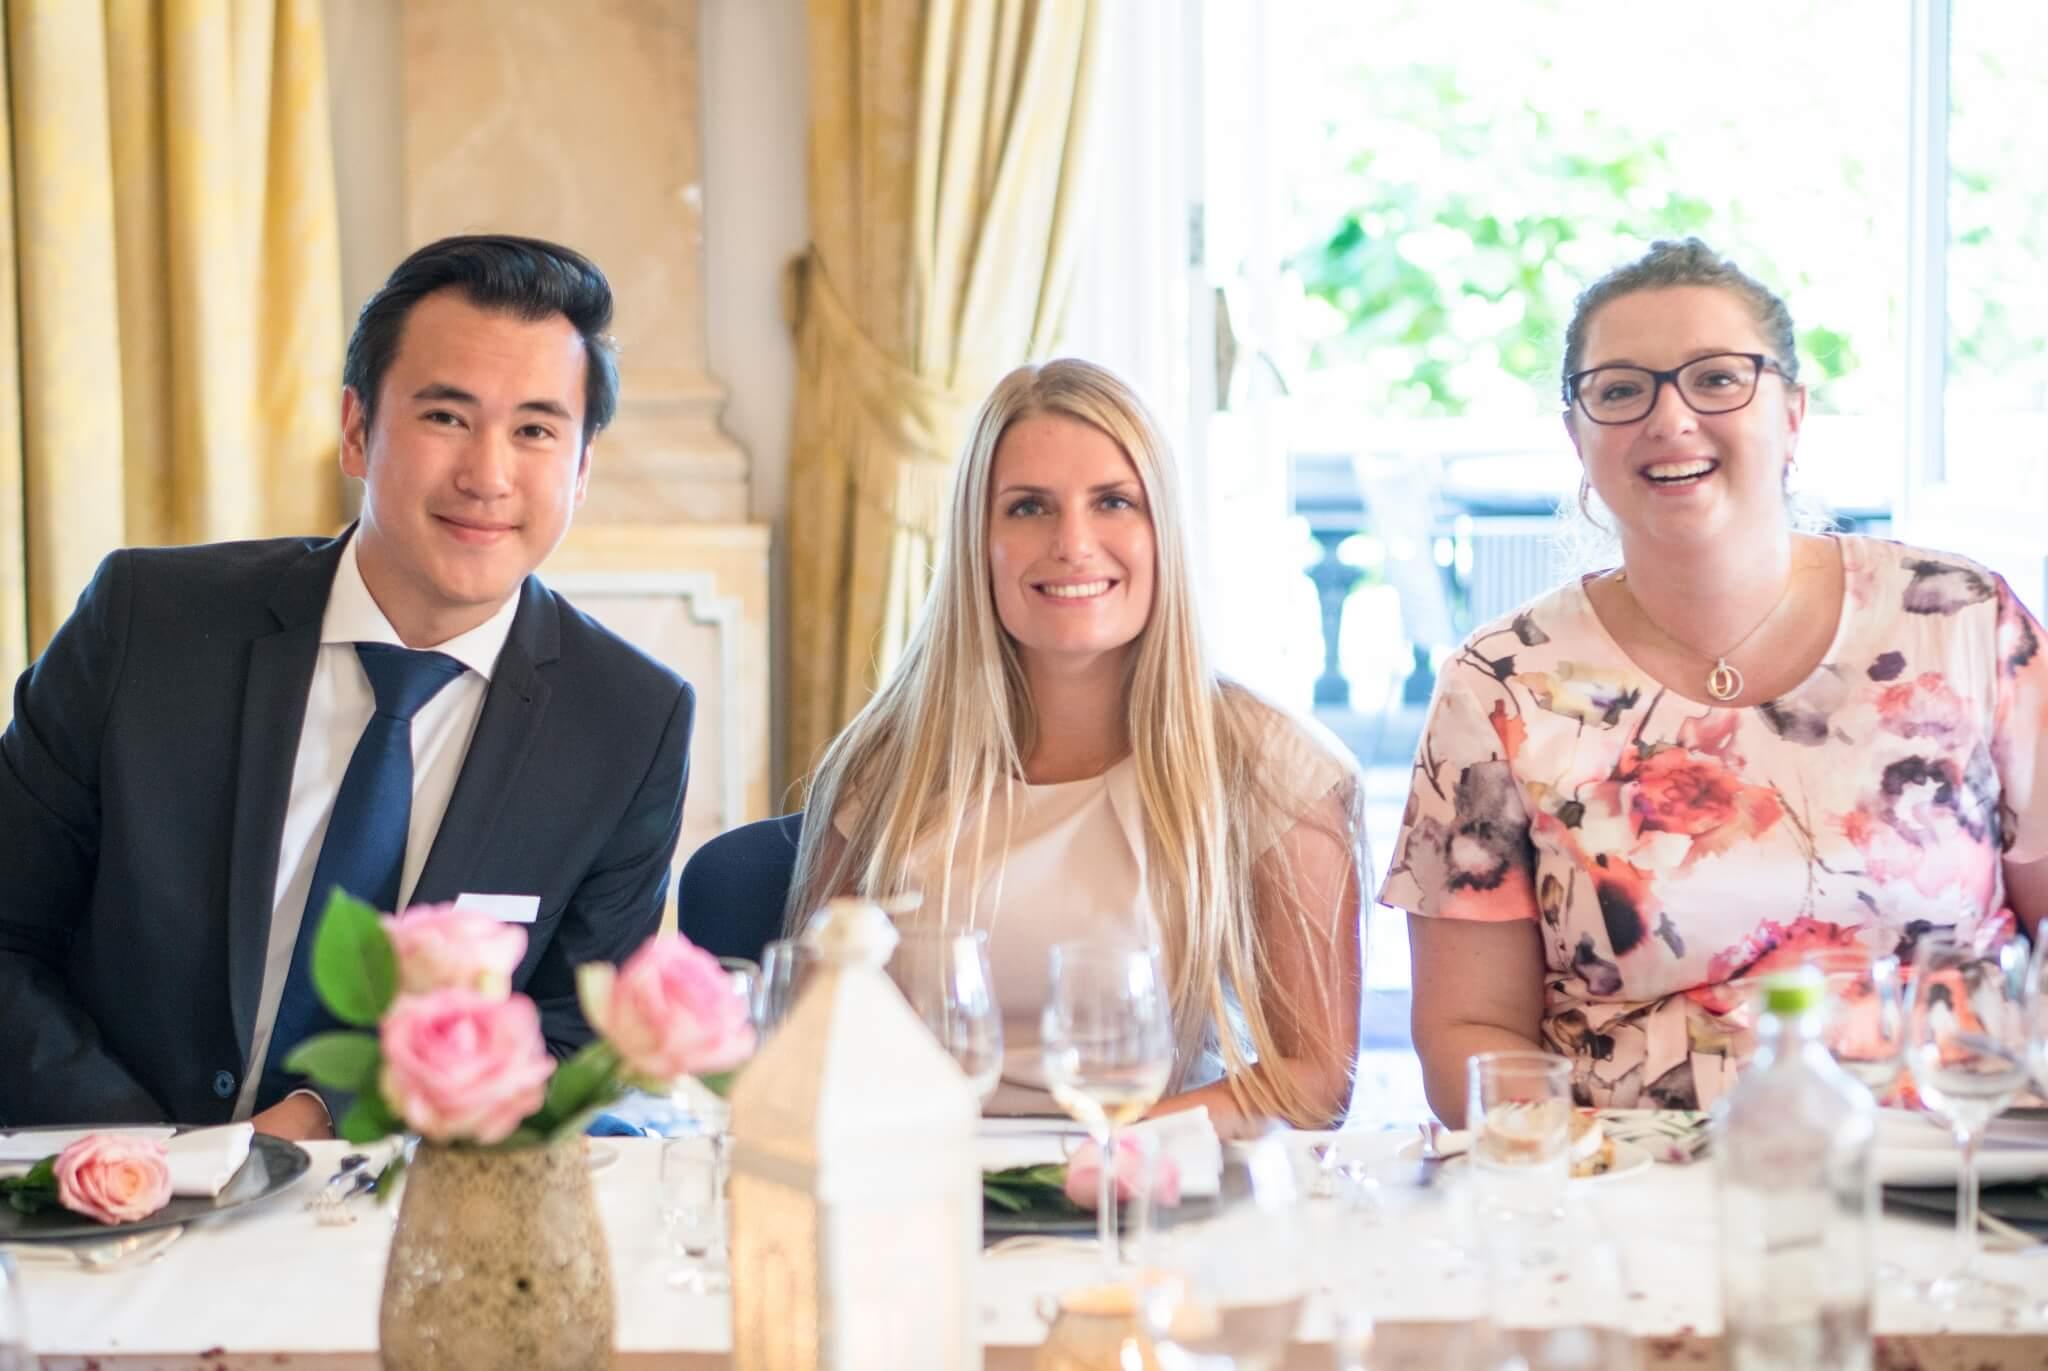 Het Grote Bloggers Diner in het Amstel Hotel